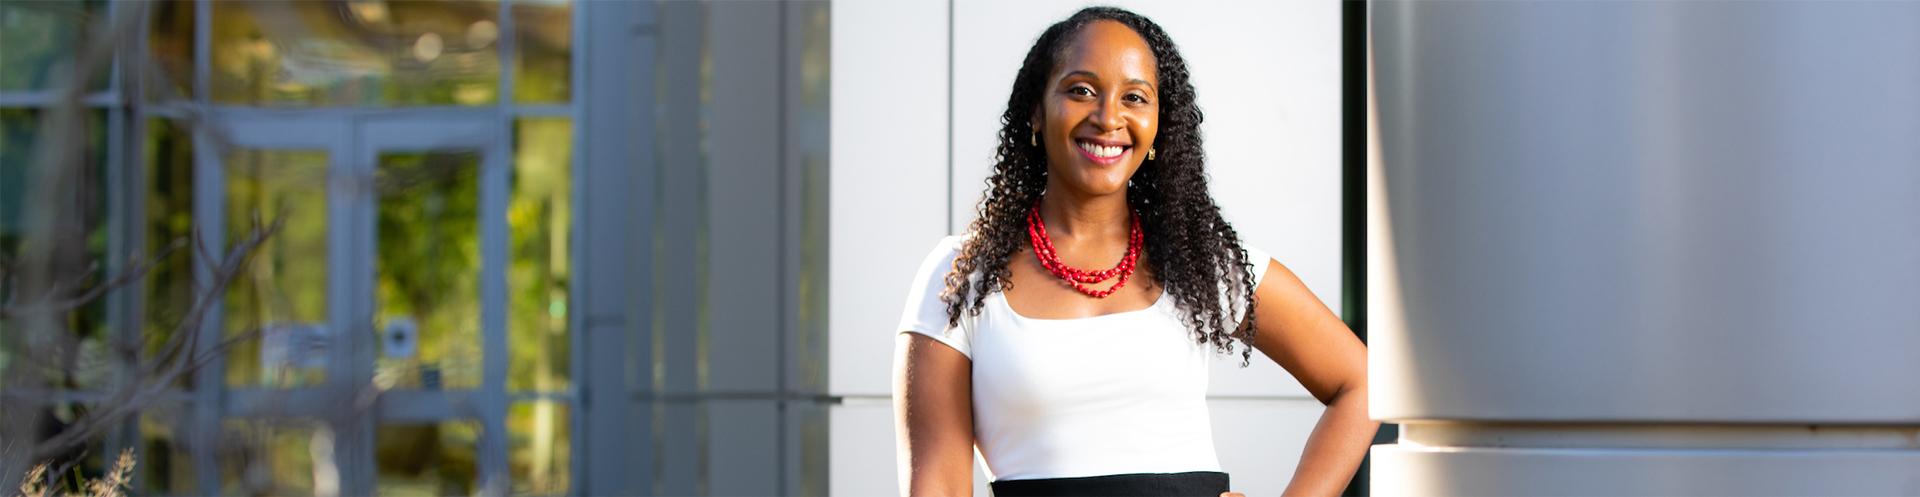 Neuroscience professor seeks answers in brain and behavior science research